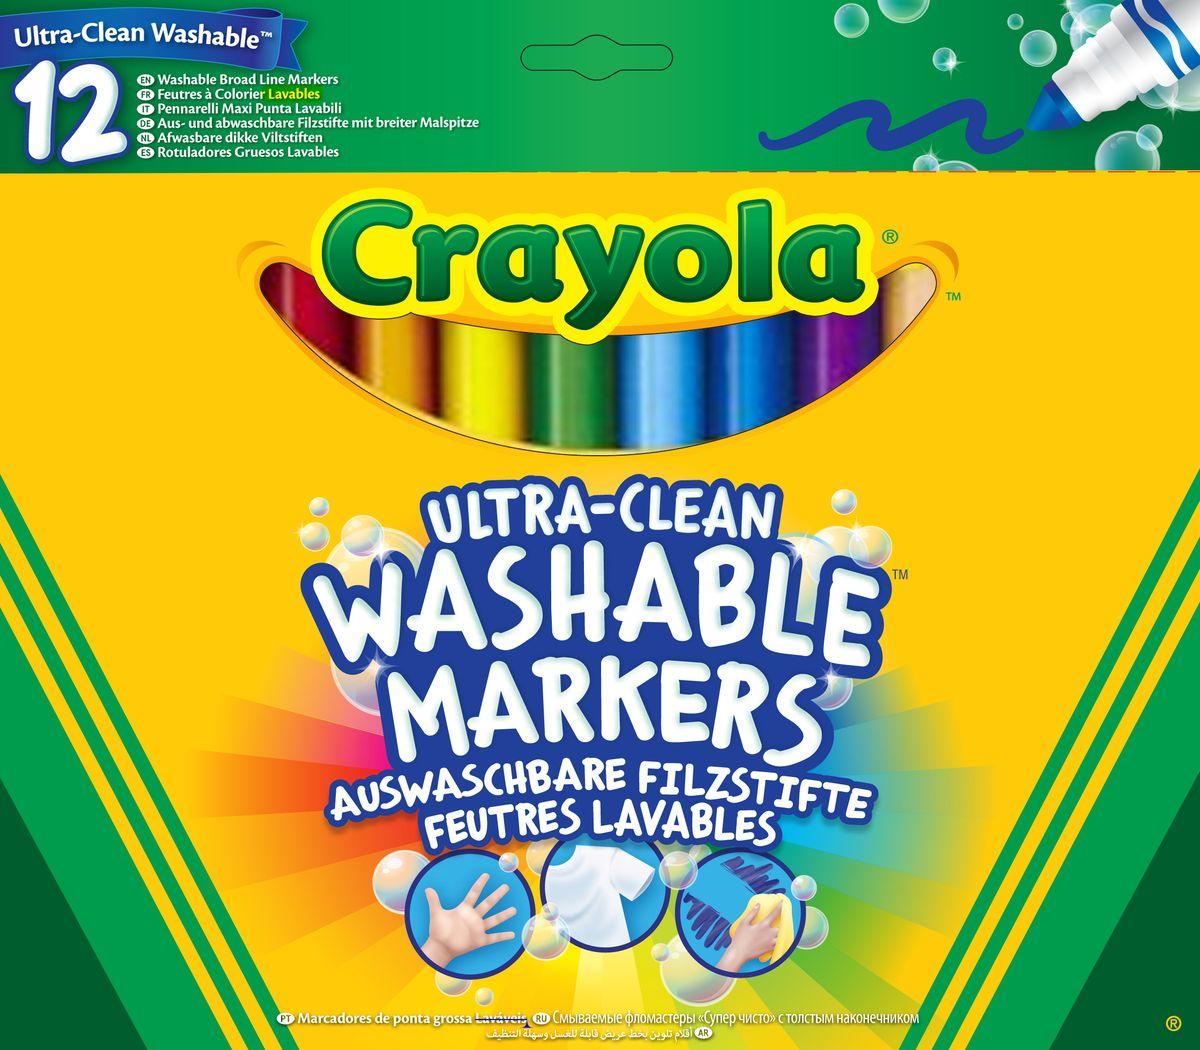 Crayola Набор фломастеров Супер чисто 12 шт tprhm c2030 high quality color copier toner powder for ricoh mpc 2030 2050 2530 2550 mpc2050 mpc2030 1kg bag color free fedex